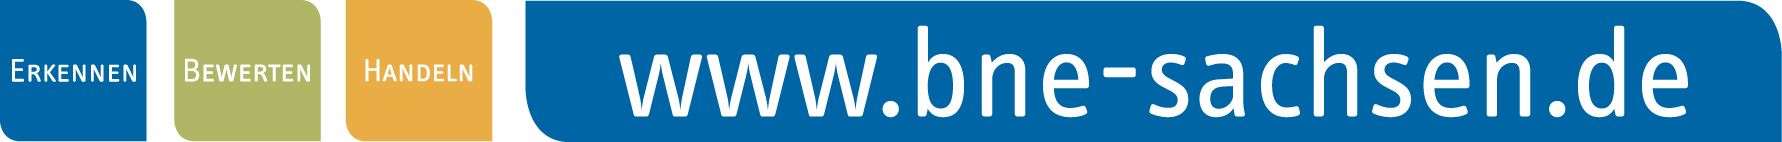 Logo des Portals www.bne-sachsen.de